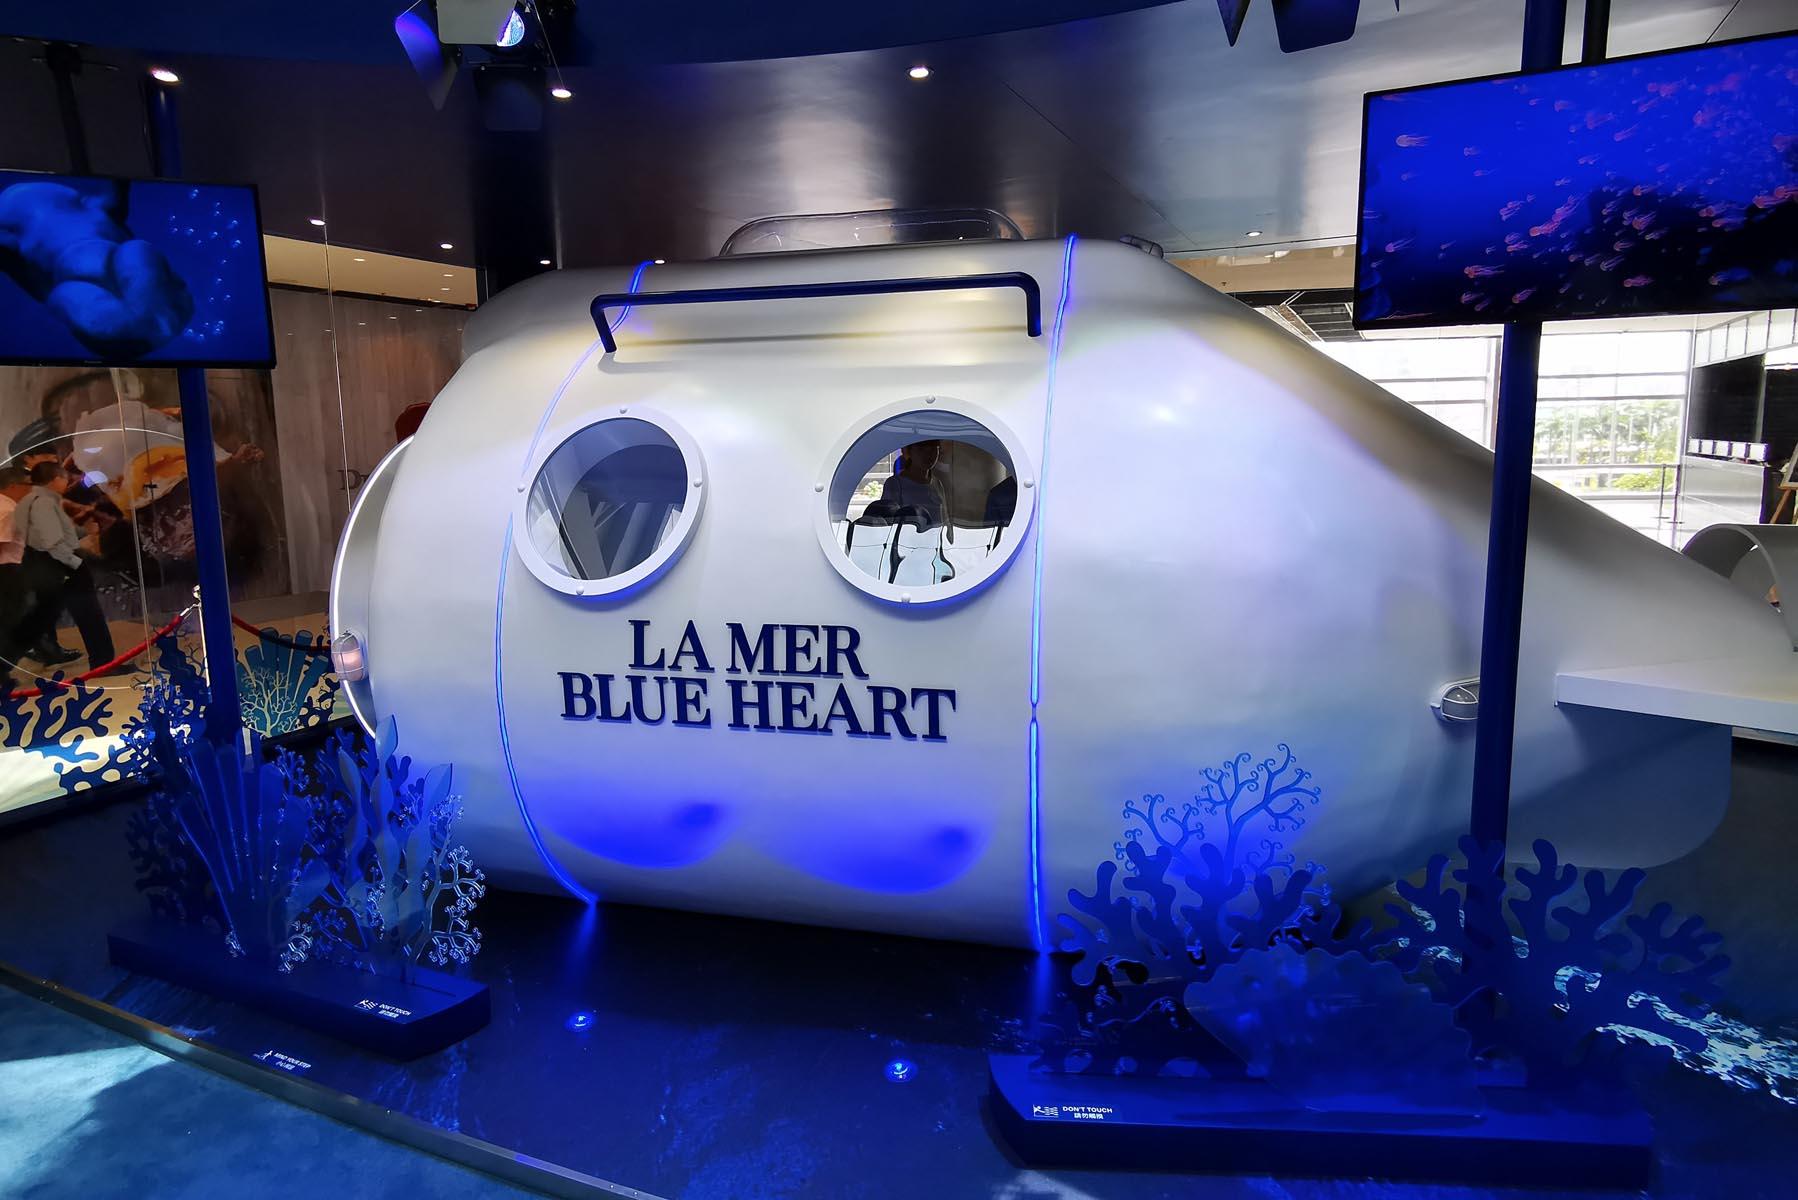 Lamer Blue Heart